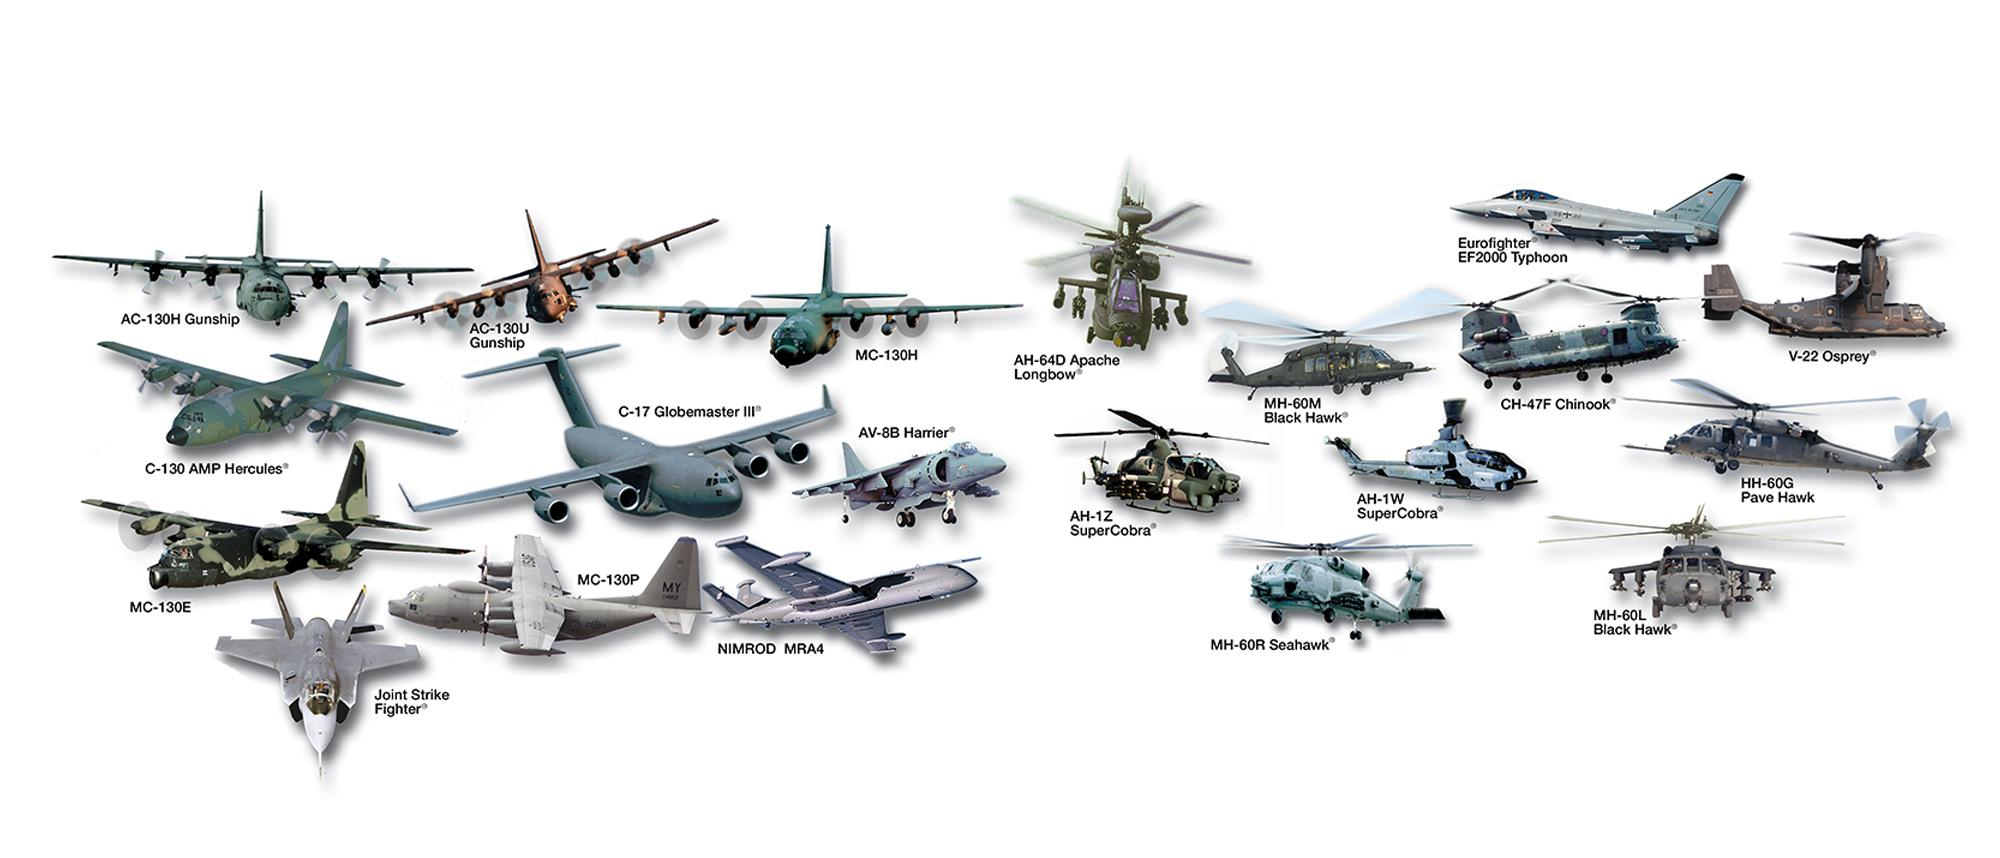 ABE, Advanced Boresight Equipment, Helicopter Boresight Technology